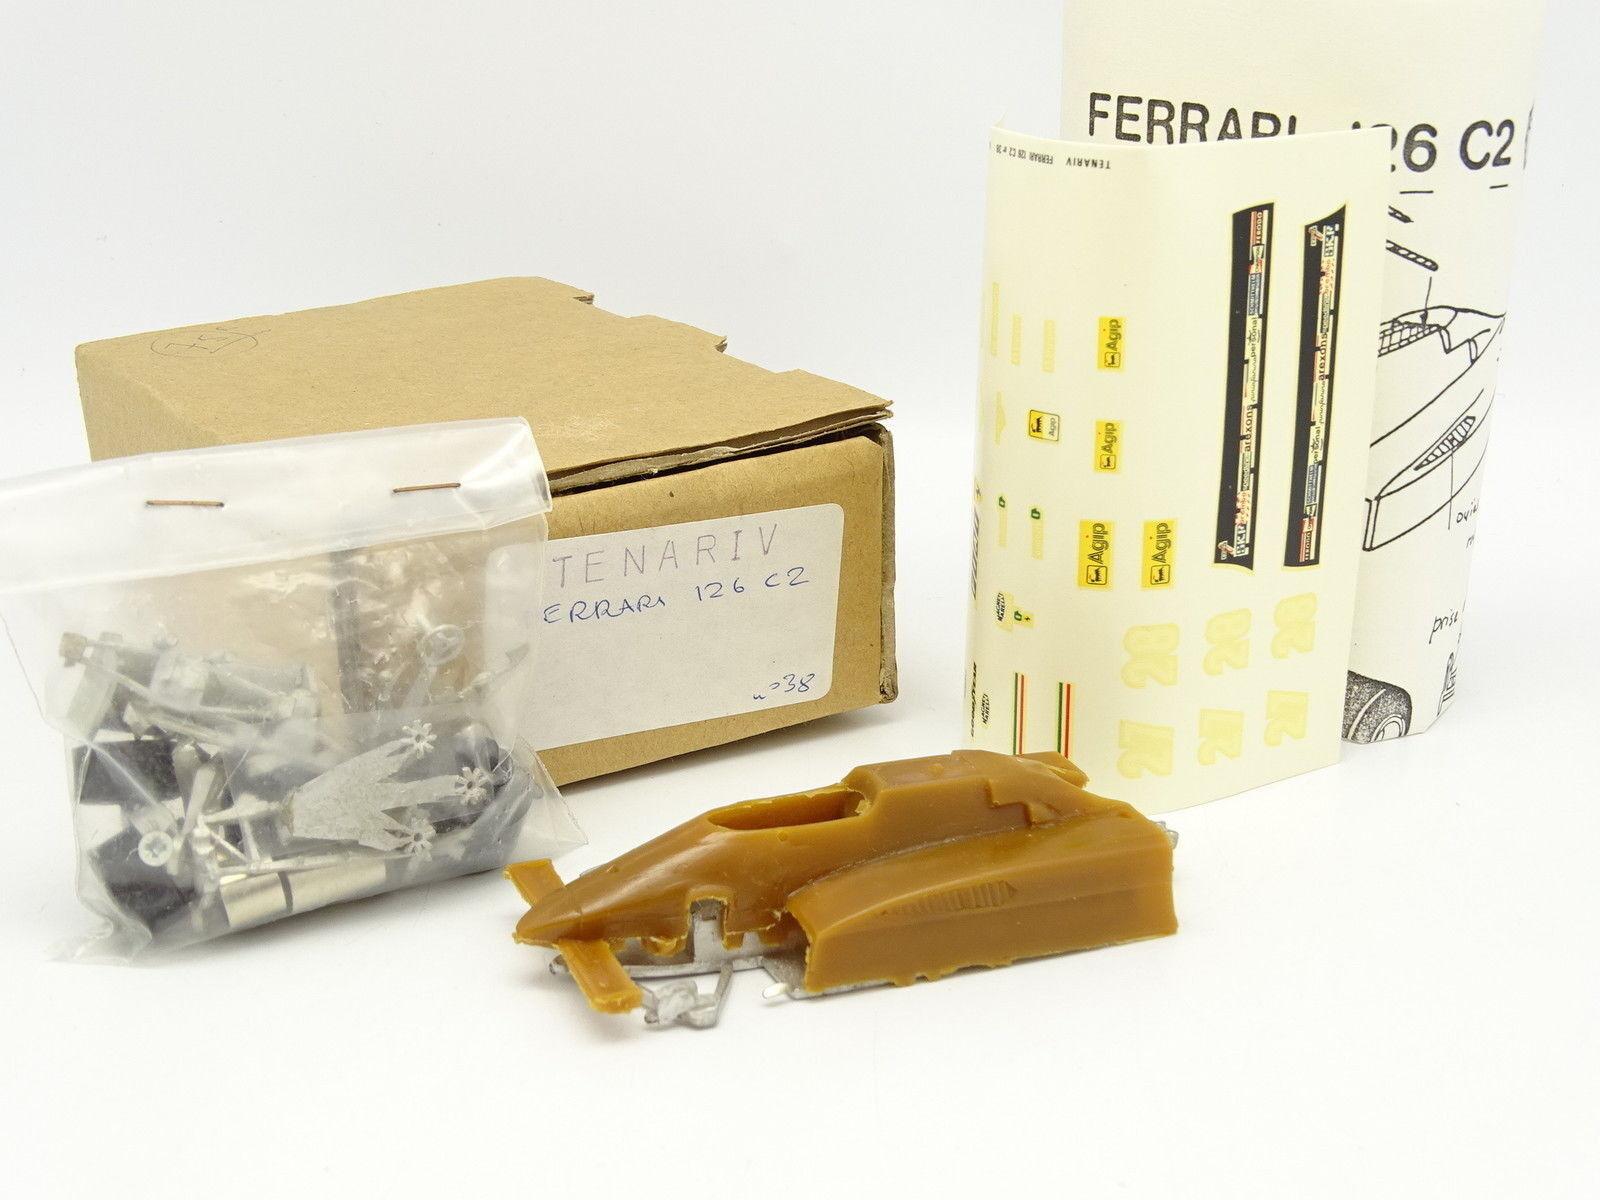 Tenariv Kit to assemble 1 43 - F1 F1 F1 Ferrari 126 C2 1982 b276dc